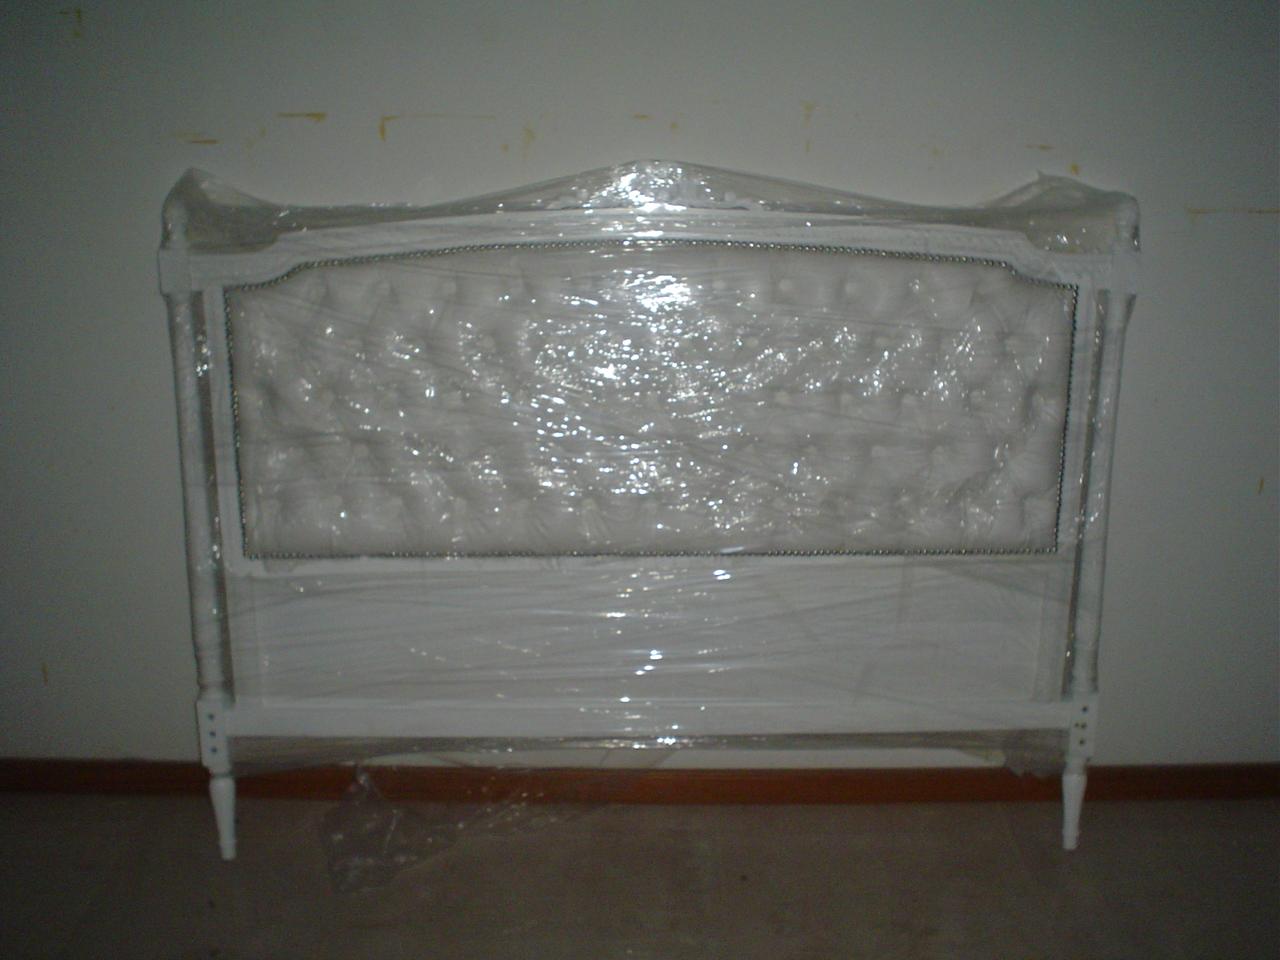 Grumsdelg interiores camas francesa - Anticuarios en cordoba ...